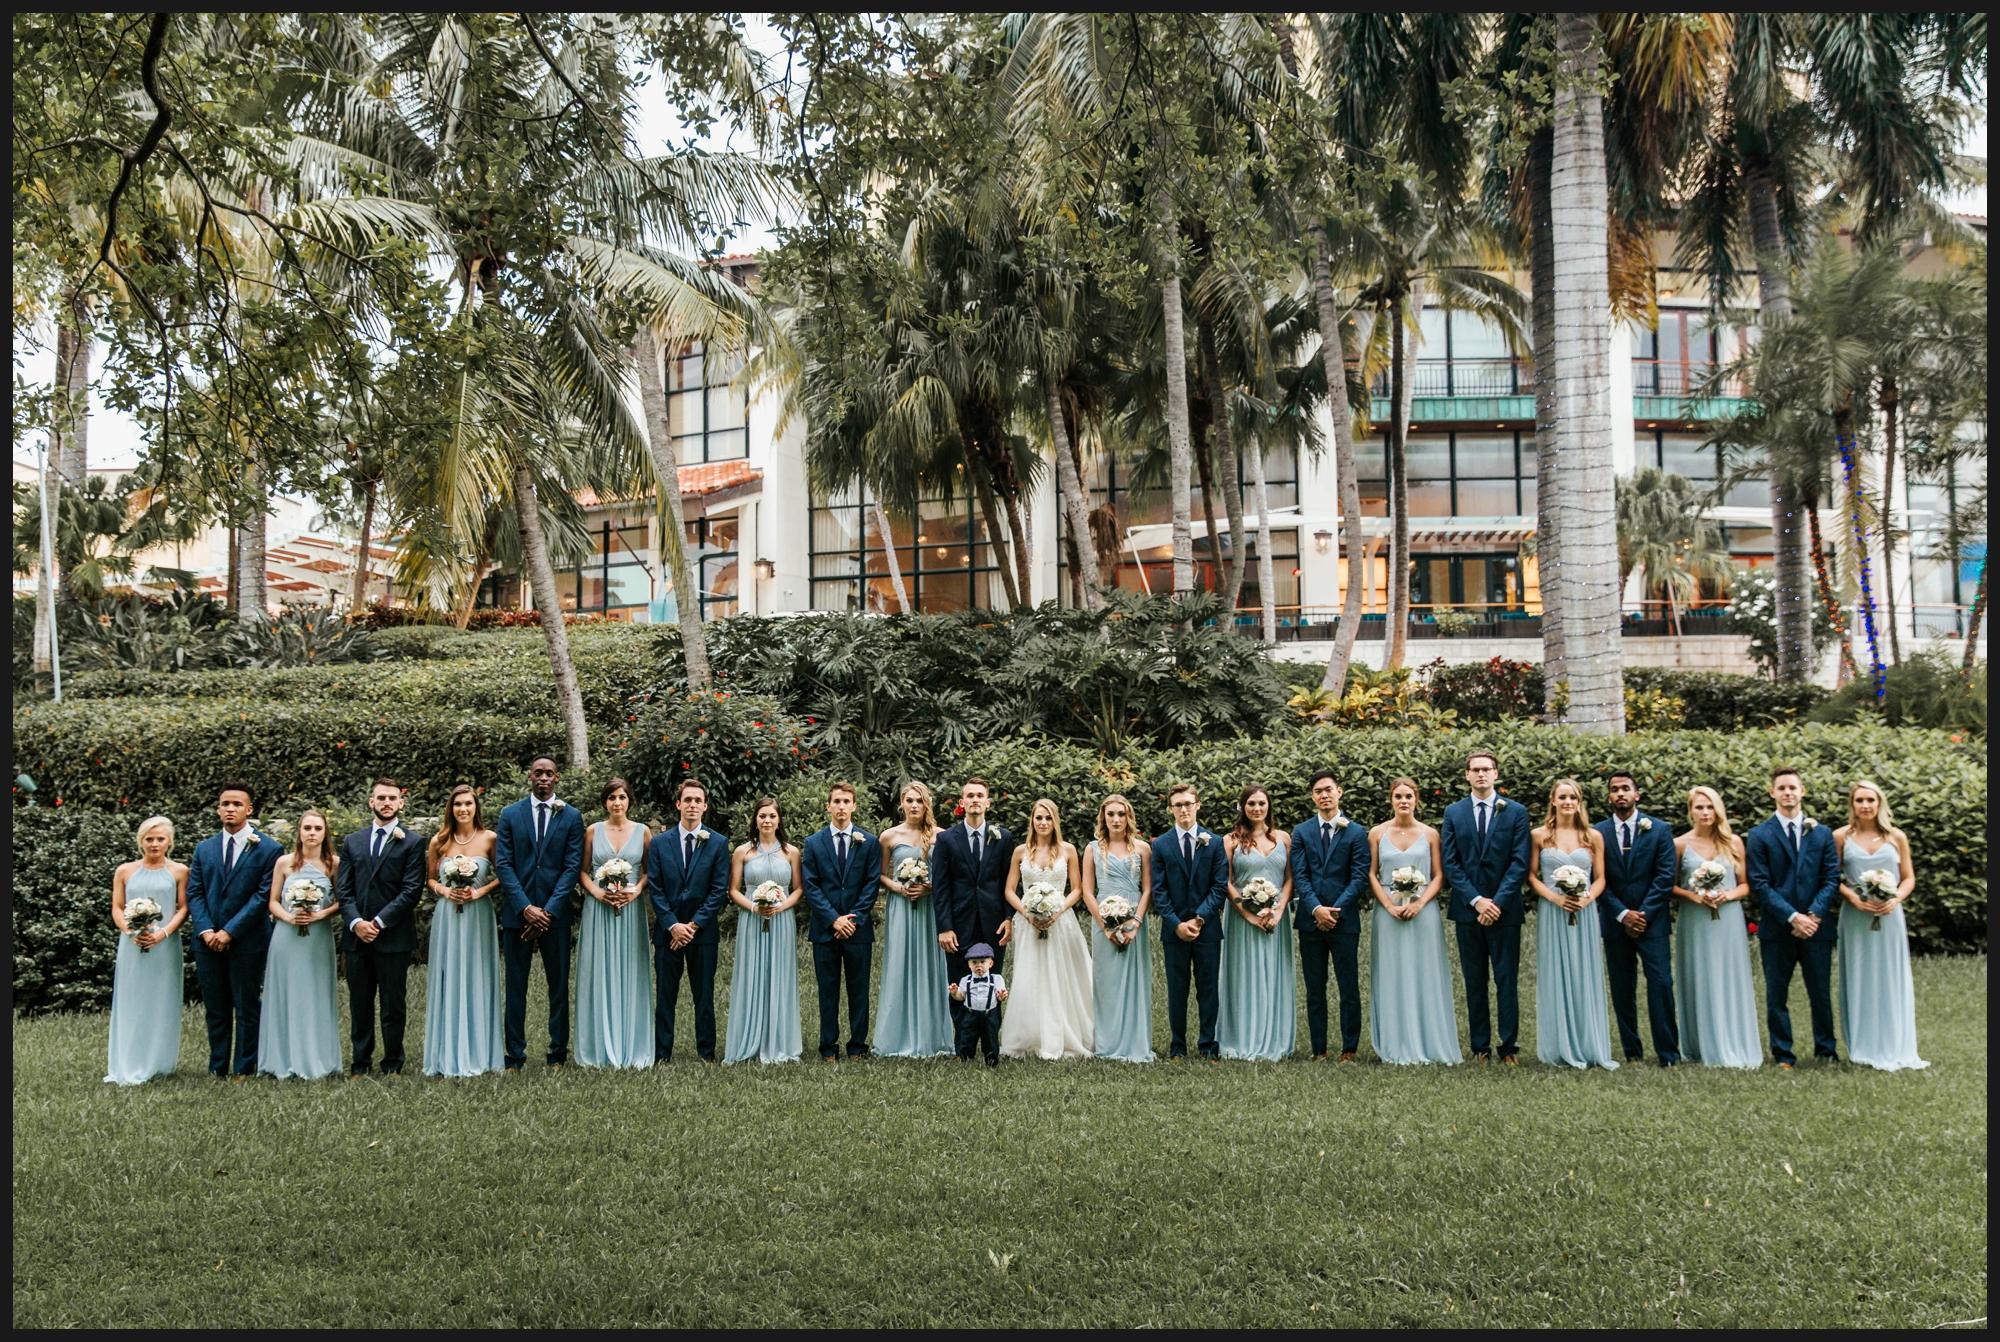 Orlando-Wedding-Photographer-destination-wedding-photographer-florida-wedding-photographer-bohemian-wedding-photographer_0094.jpg